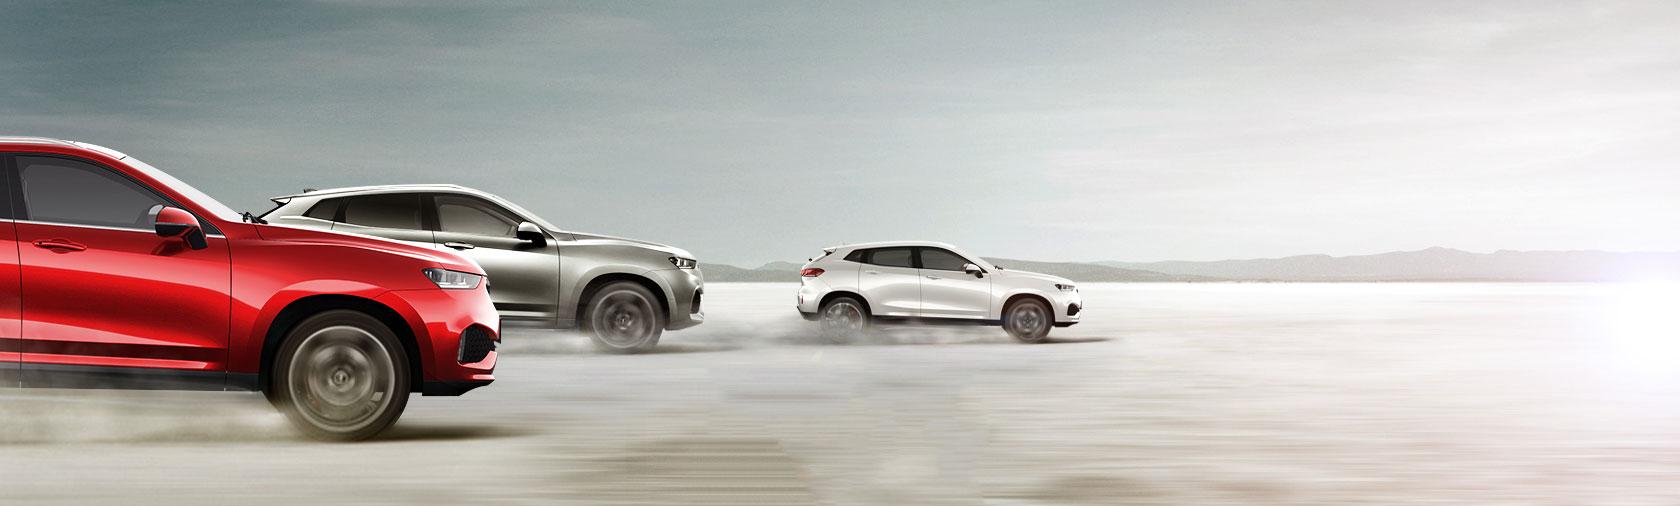 Great Wall Motors chinese cars